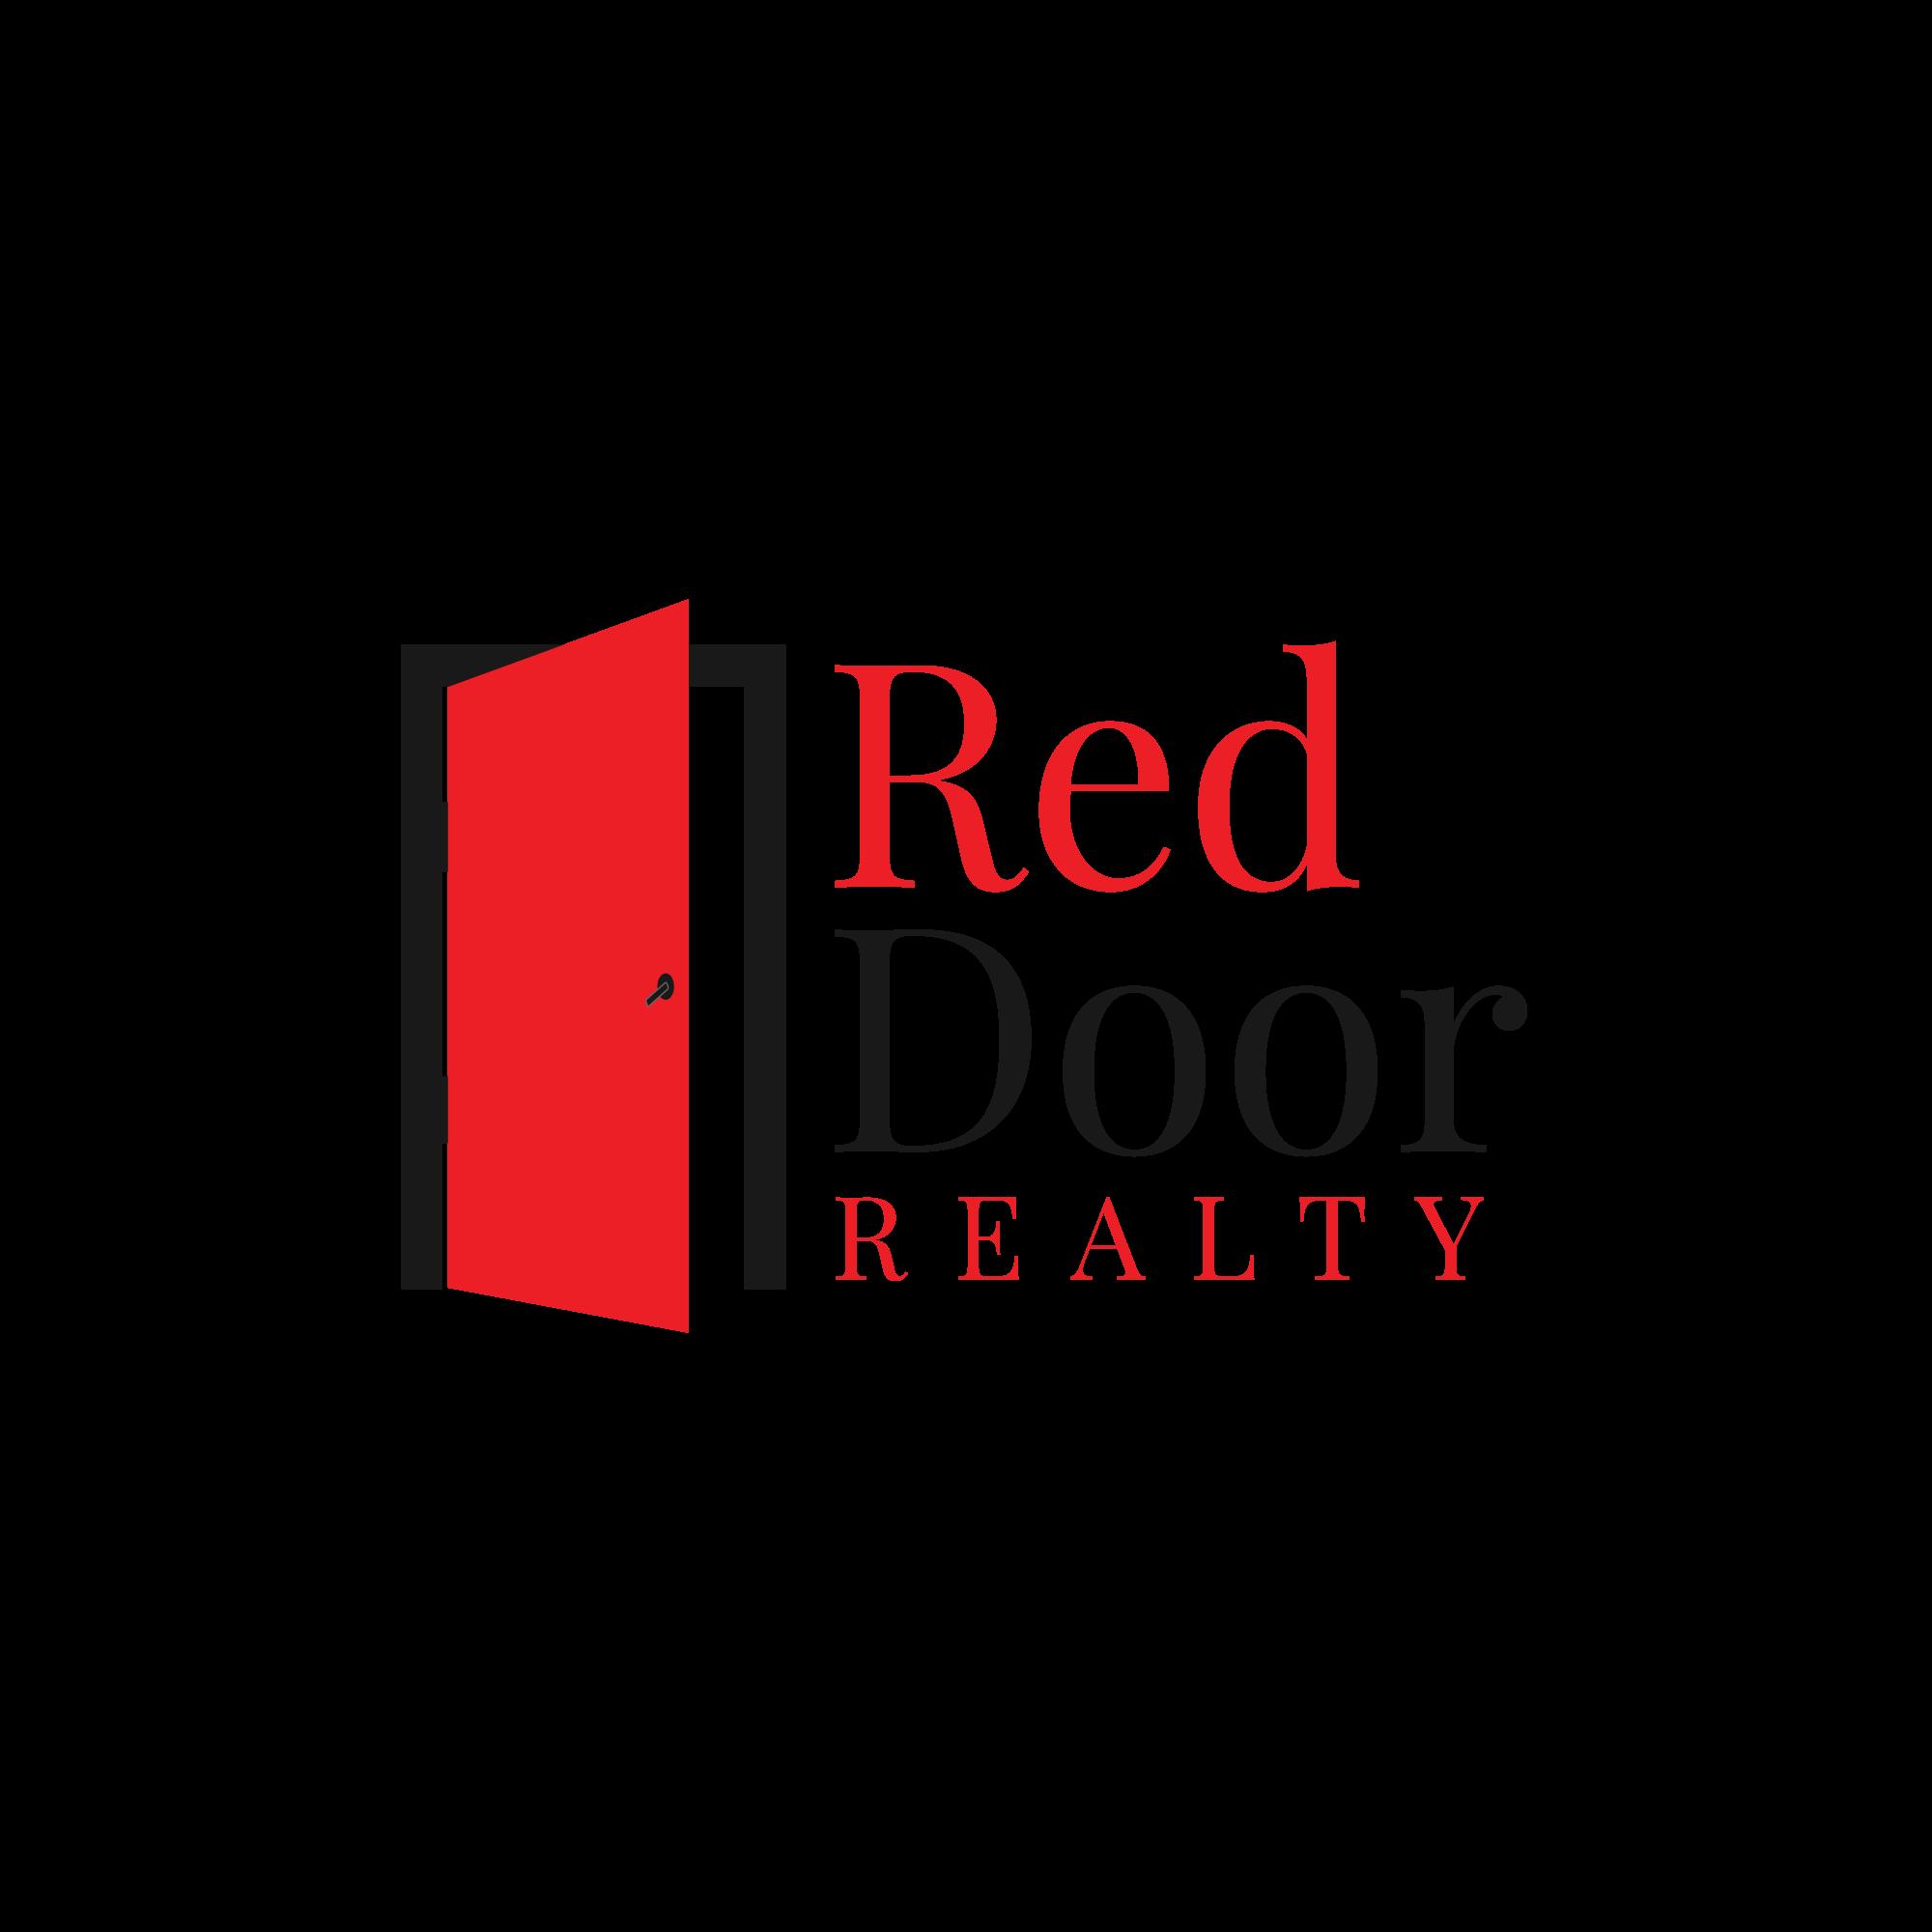 Red door logo on transparent background.png